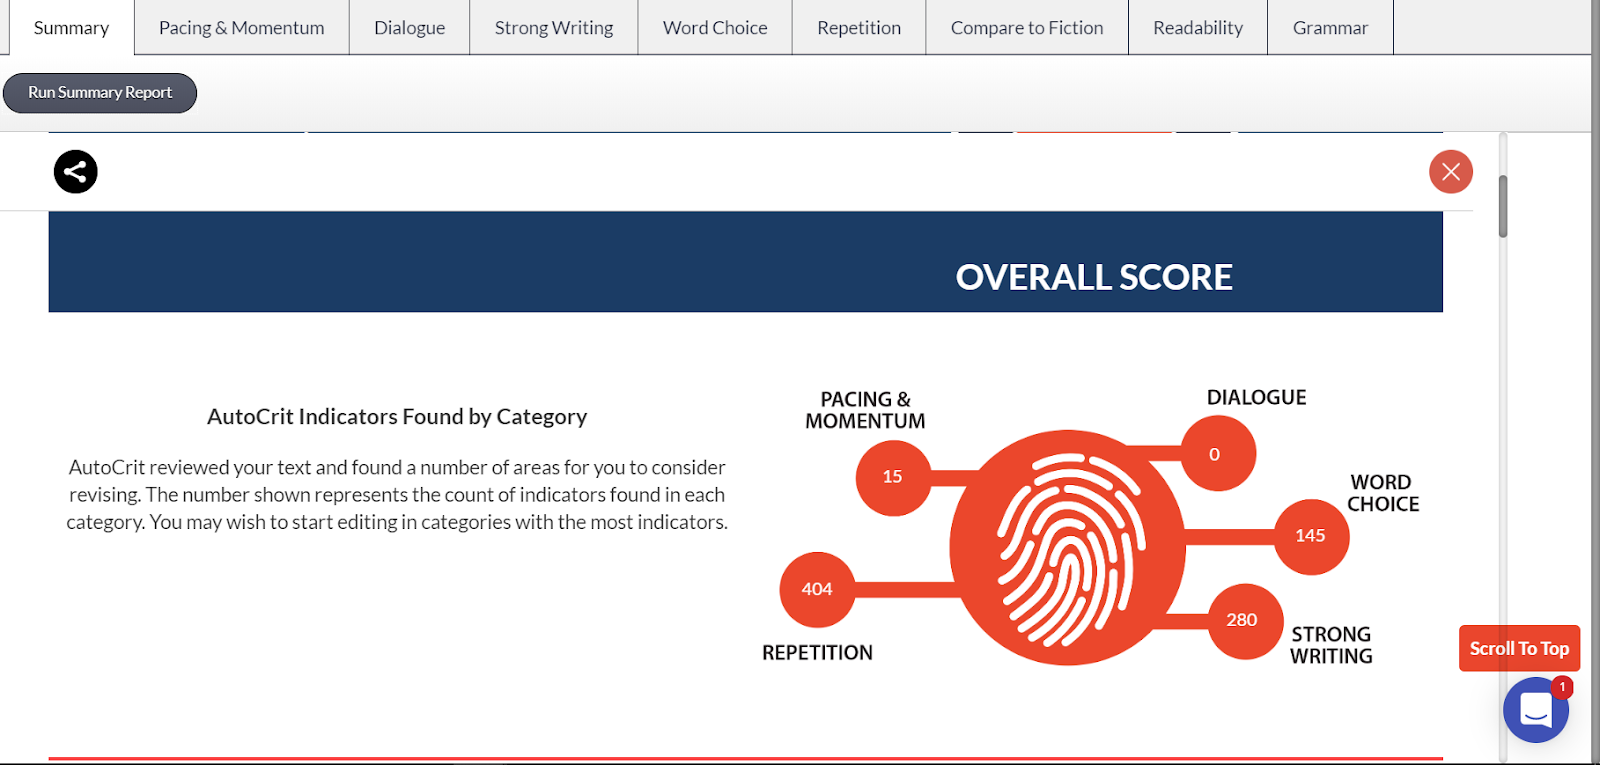 Sample Autocrit summary score